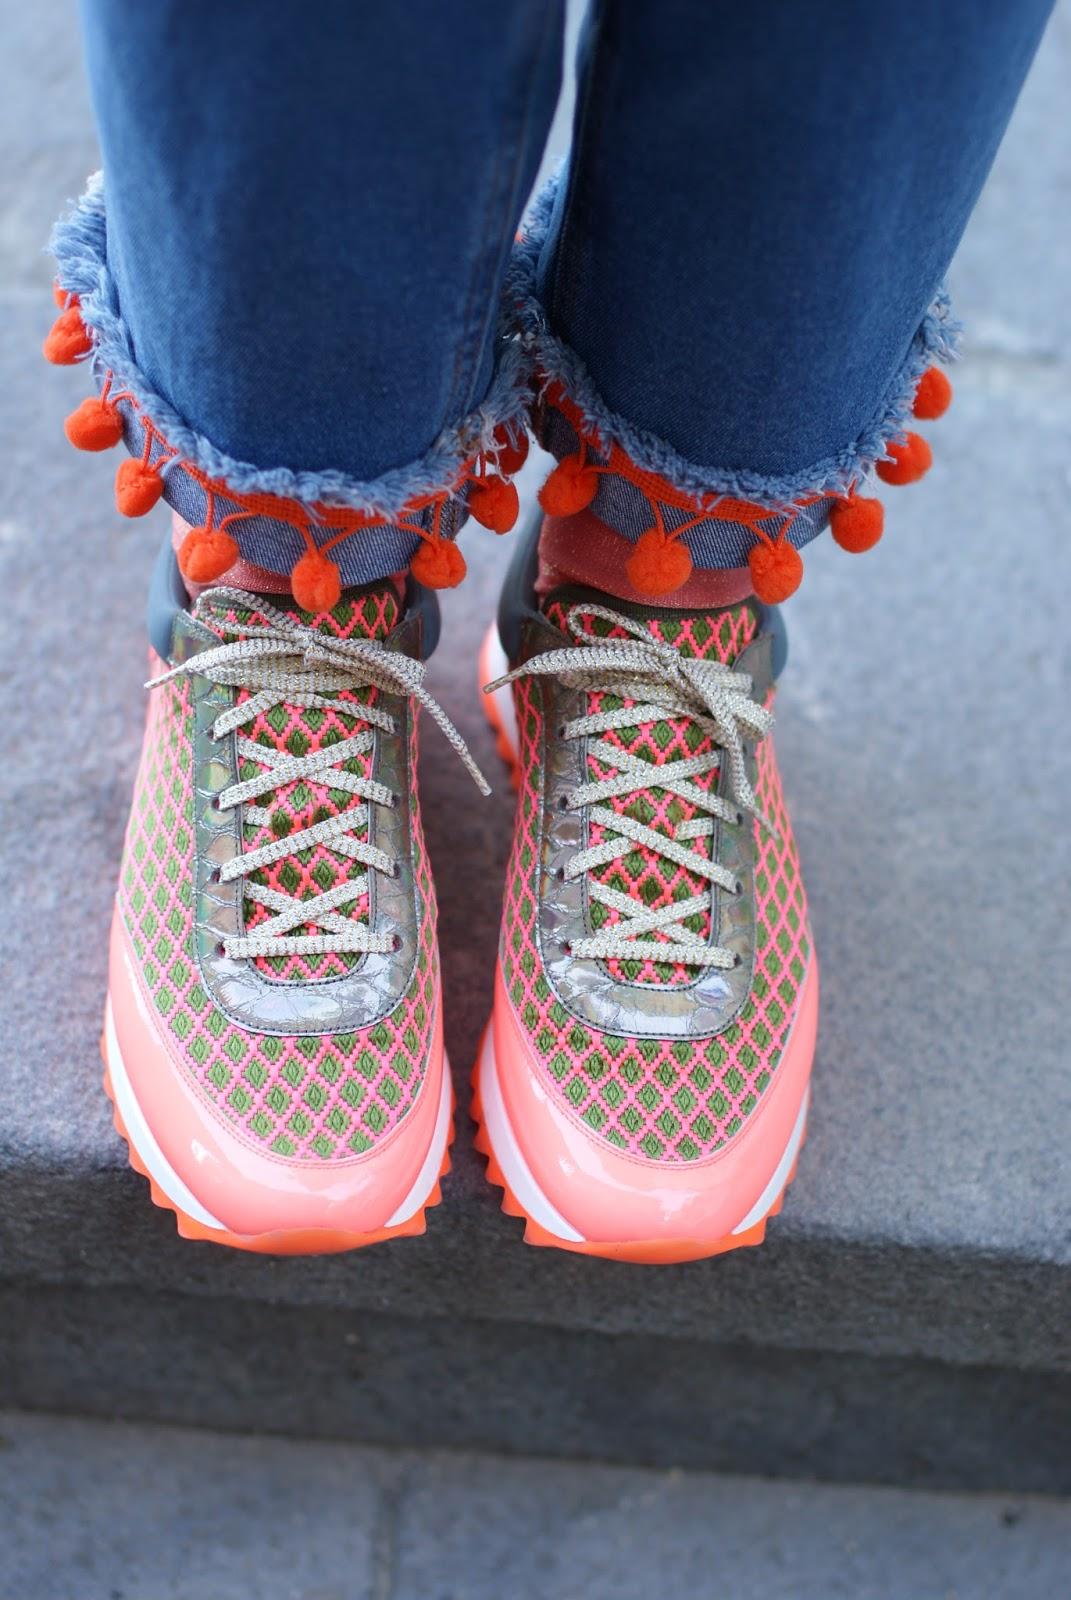 uno8uno Eva muraki sneakers, 181 sneakers on Fashion and Cookies fashion blog, fashion blogger style